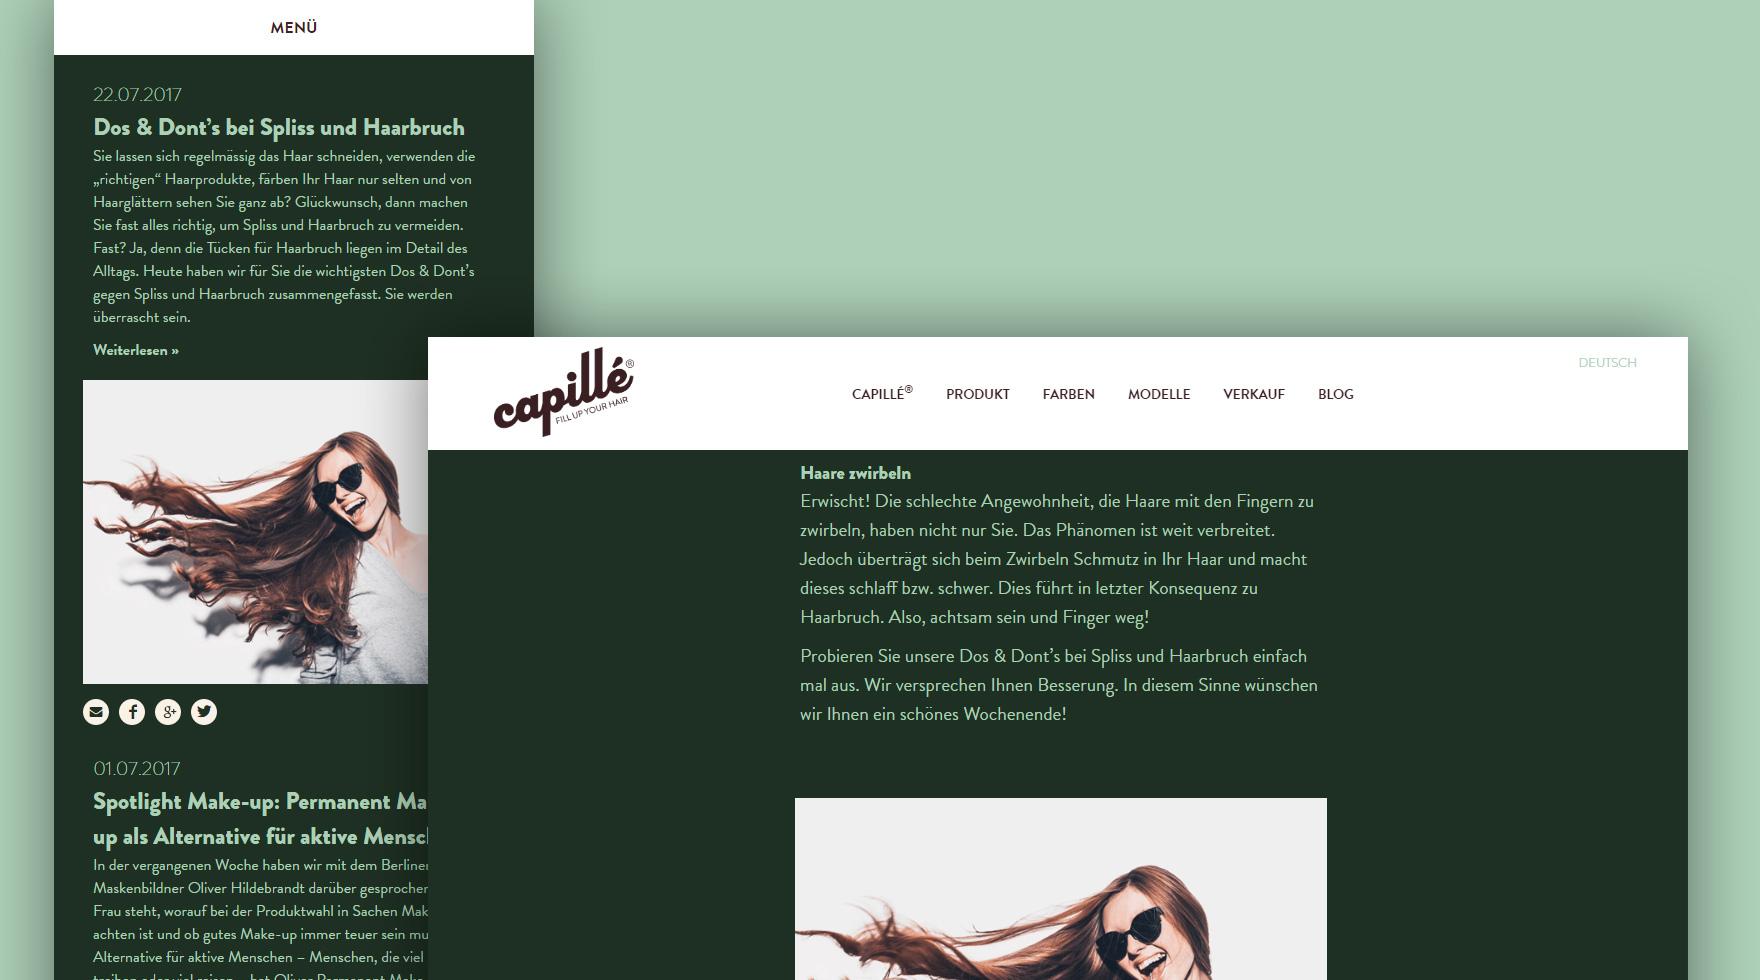 capille-blog-zürich-agentur